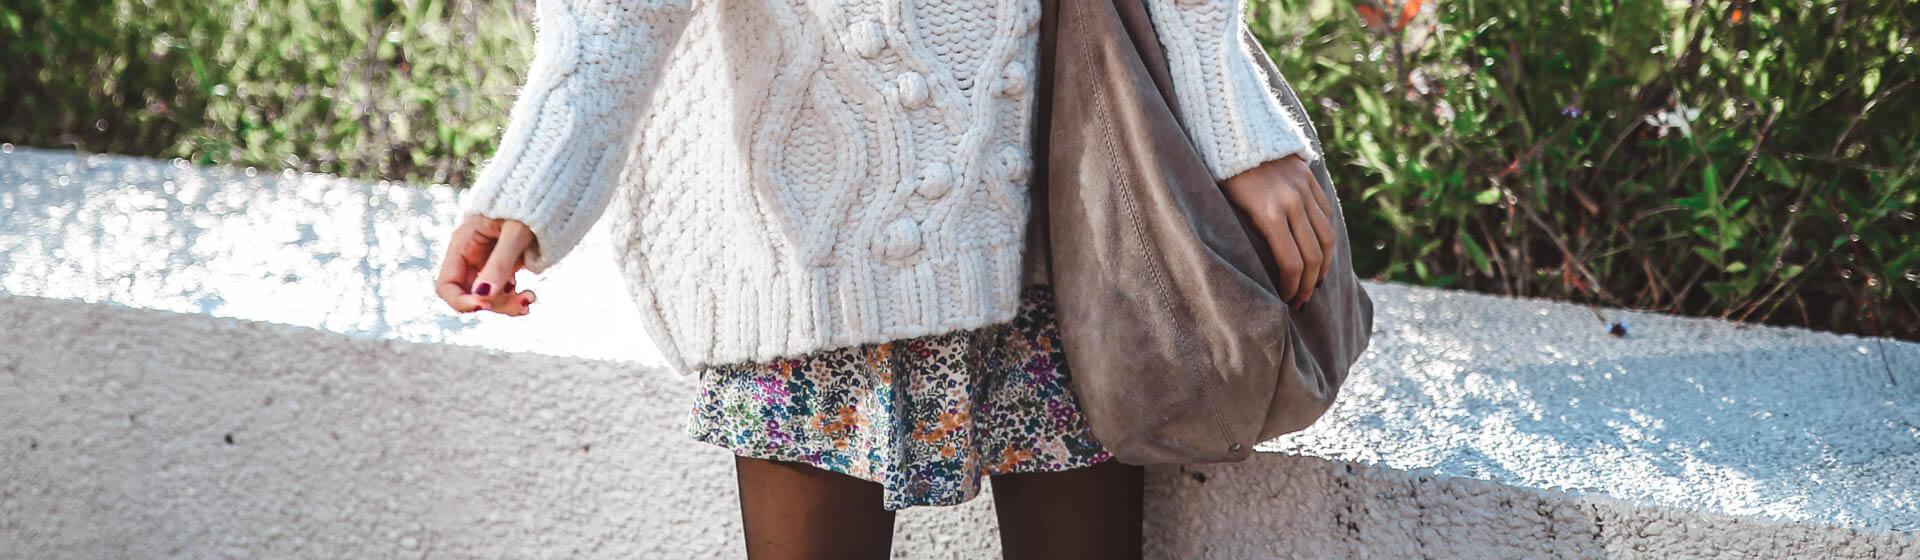 Uni Outfit im Herbst kombinieren